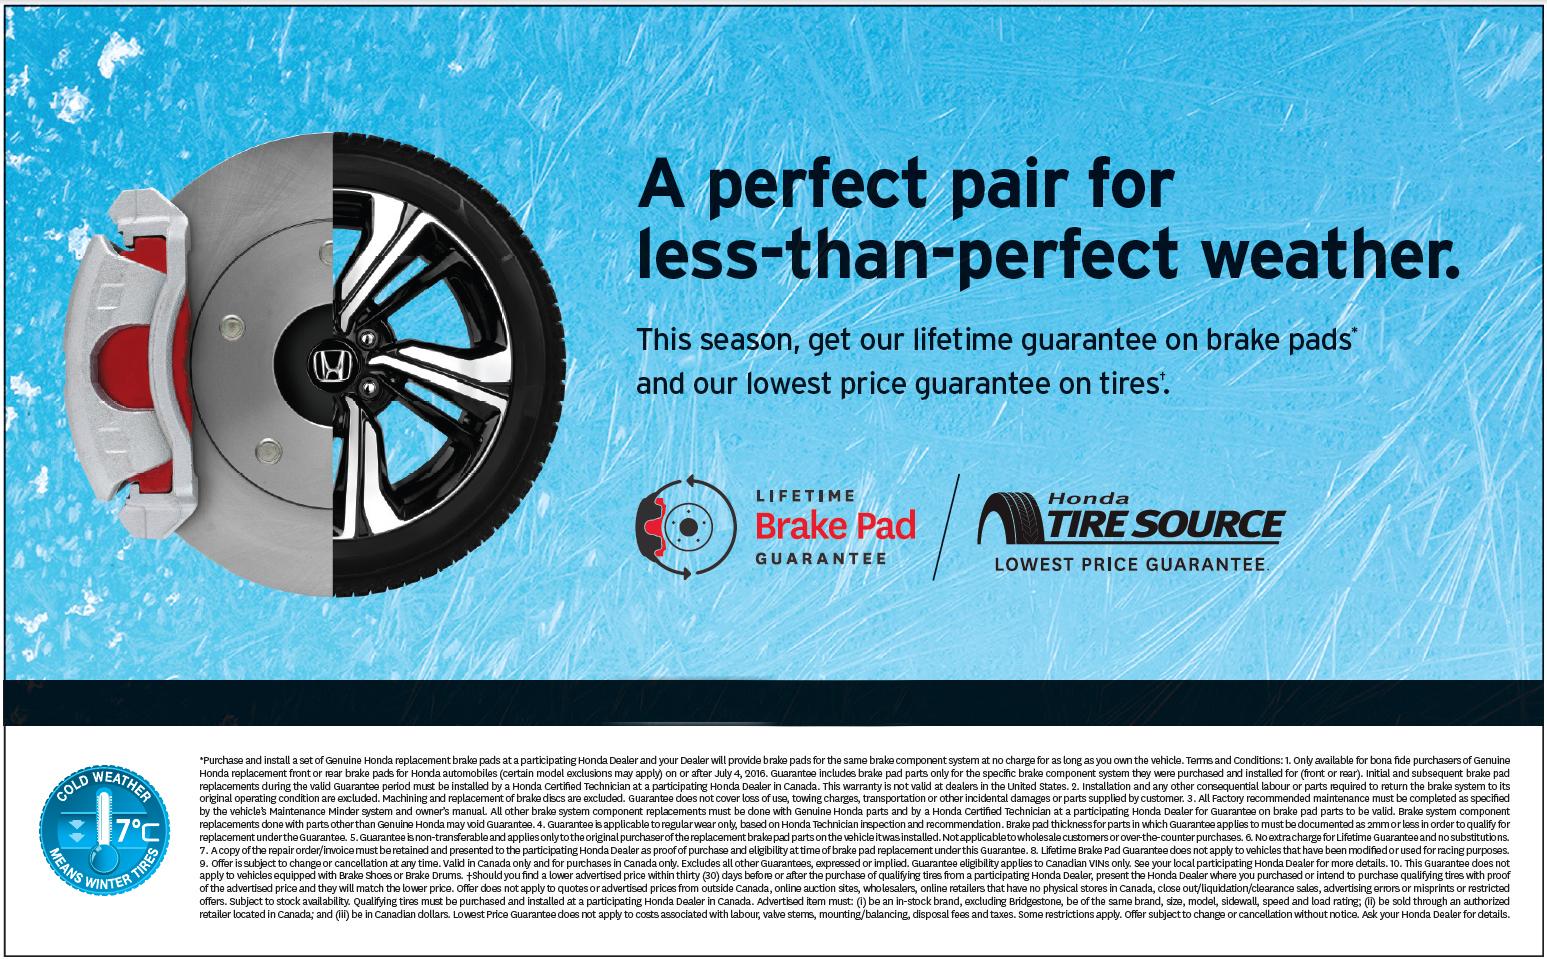 Lifetime guarantee on brake pads